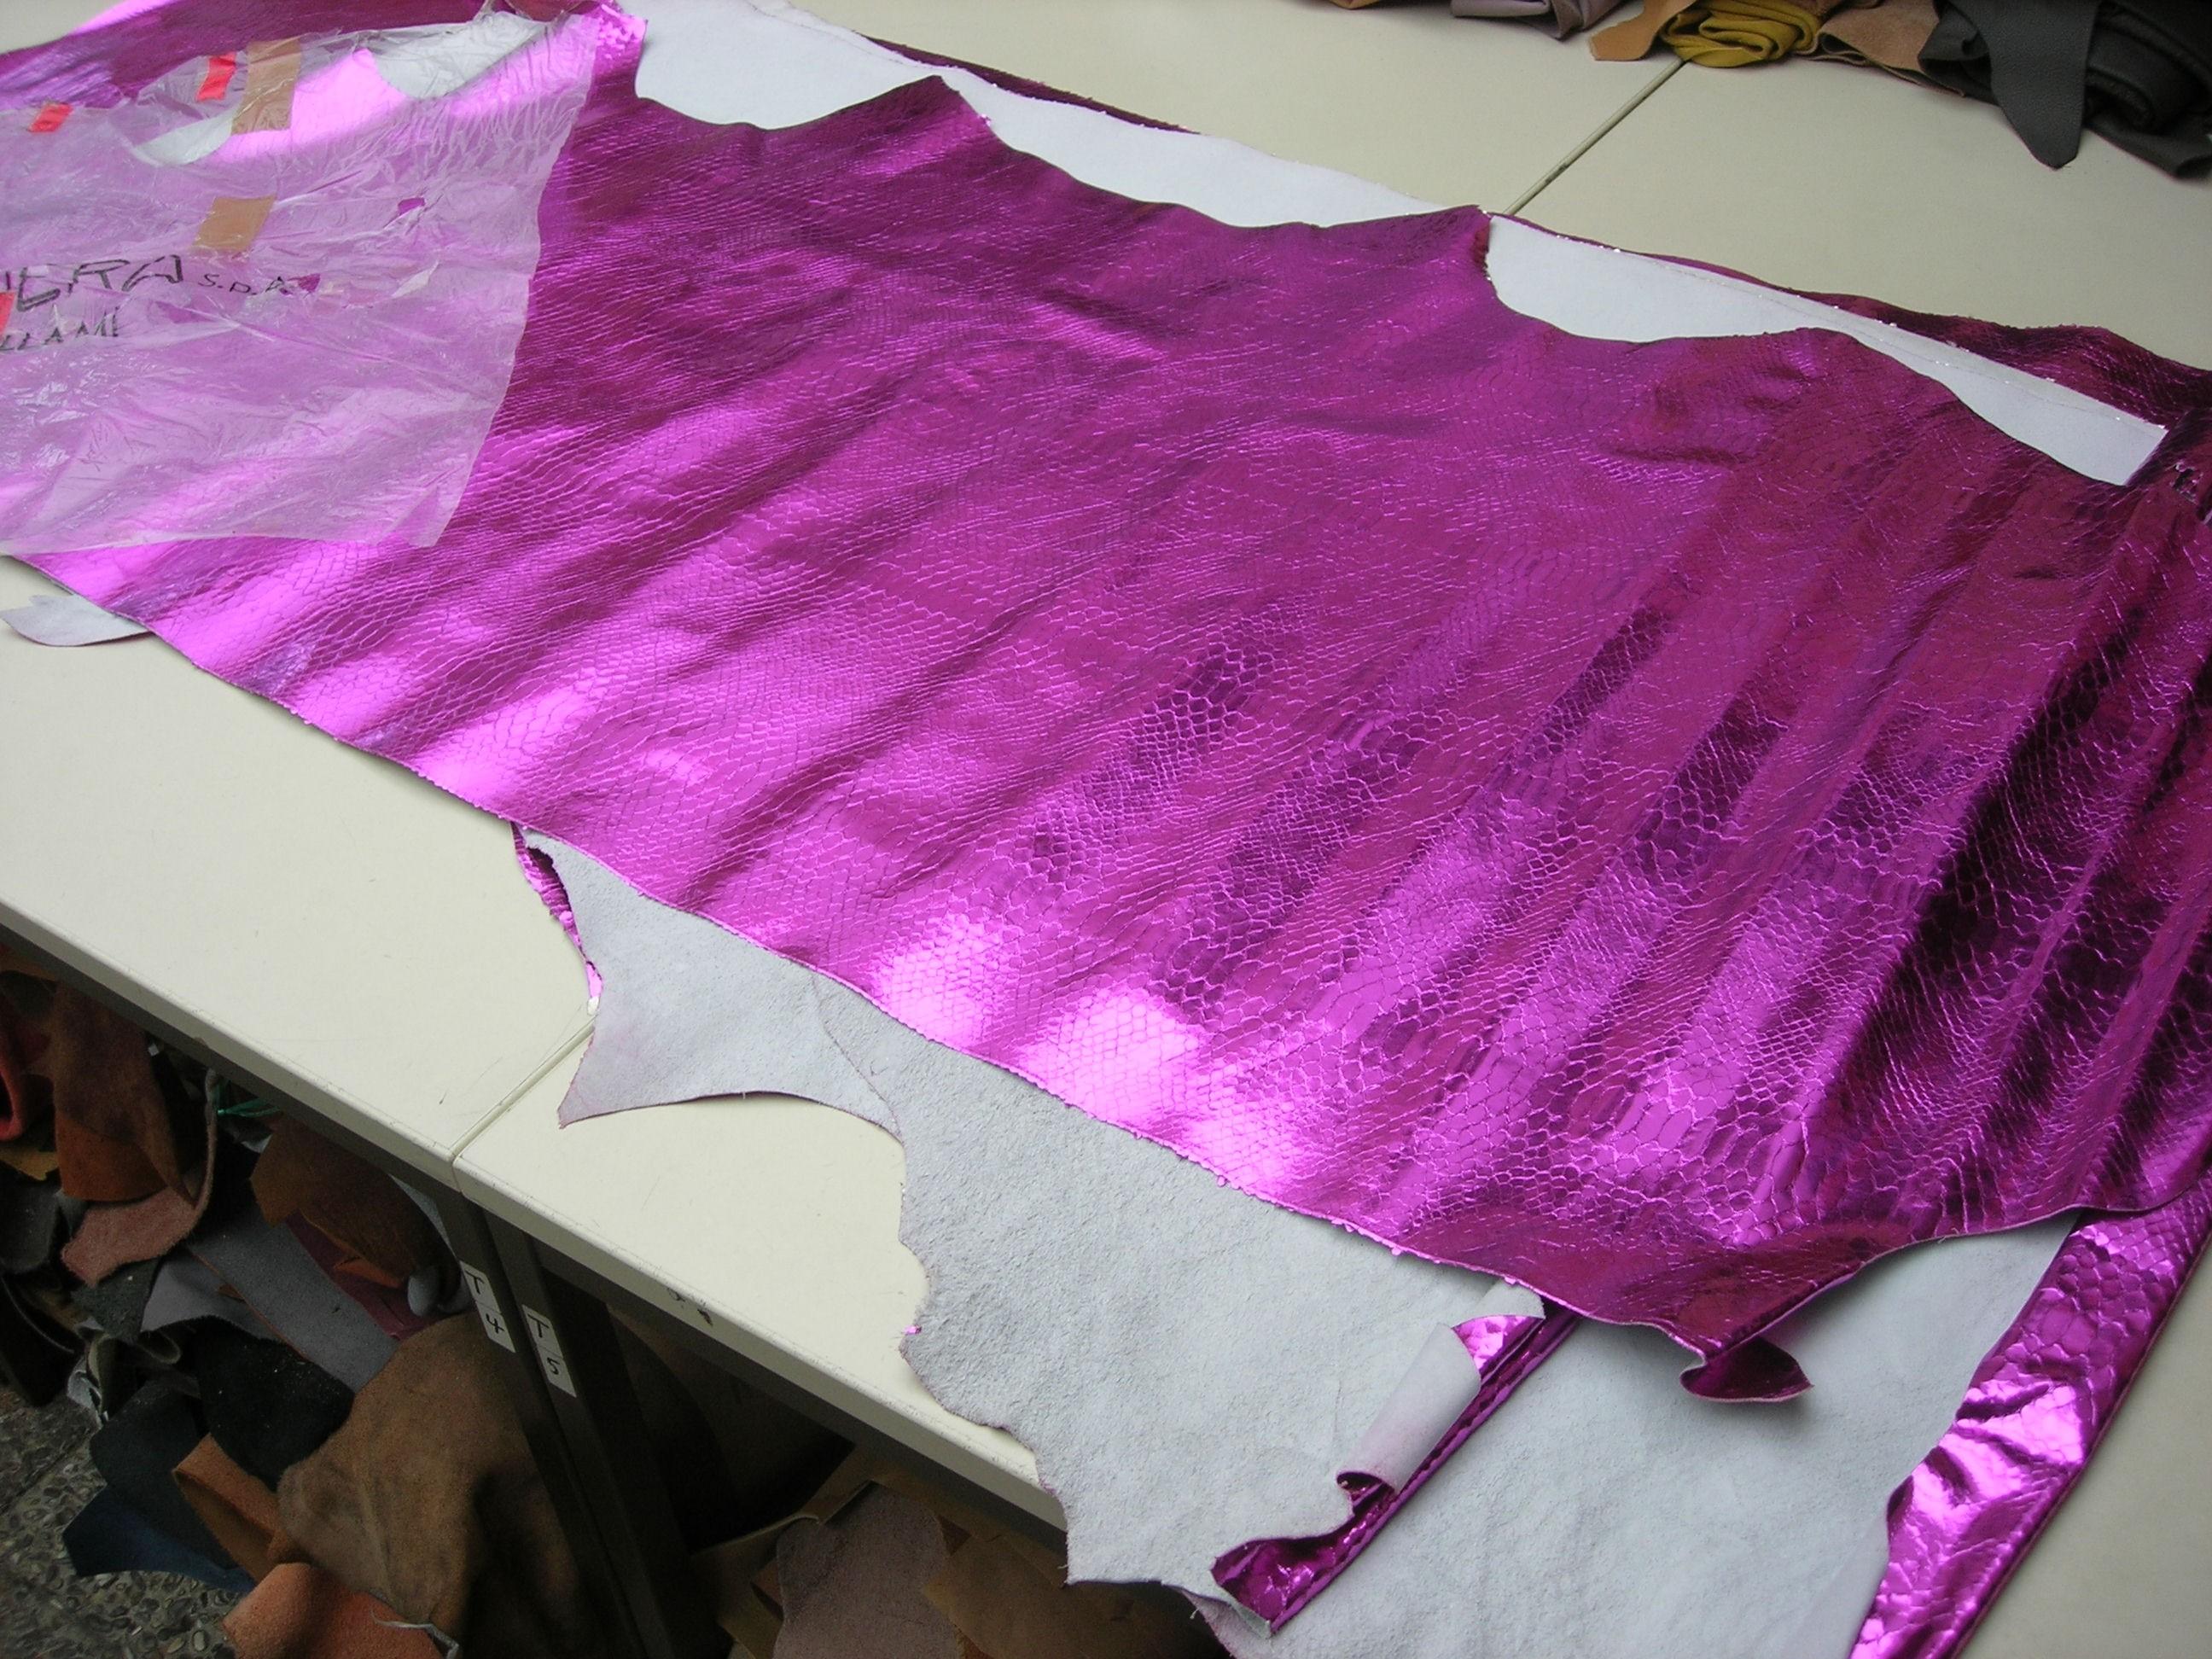 Kalbhälften pink-kroko-spiegelglanz (O1317PK)